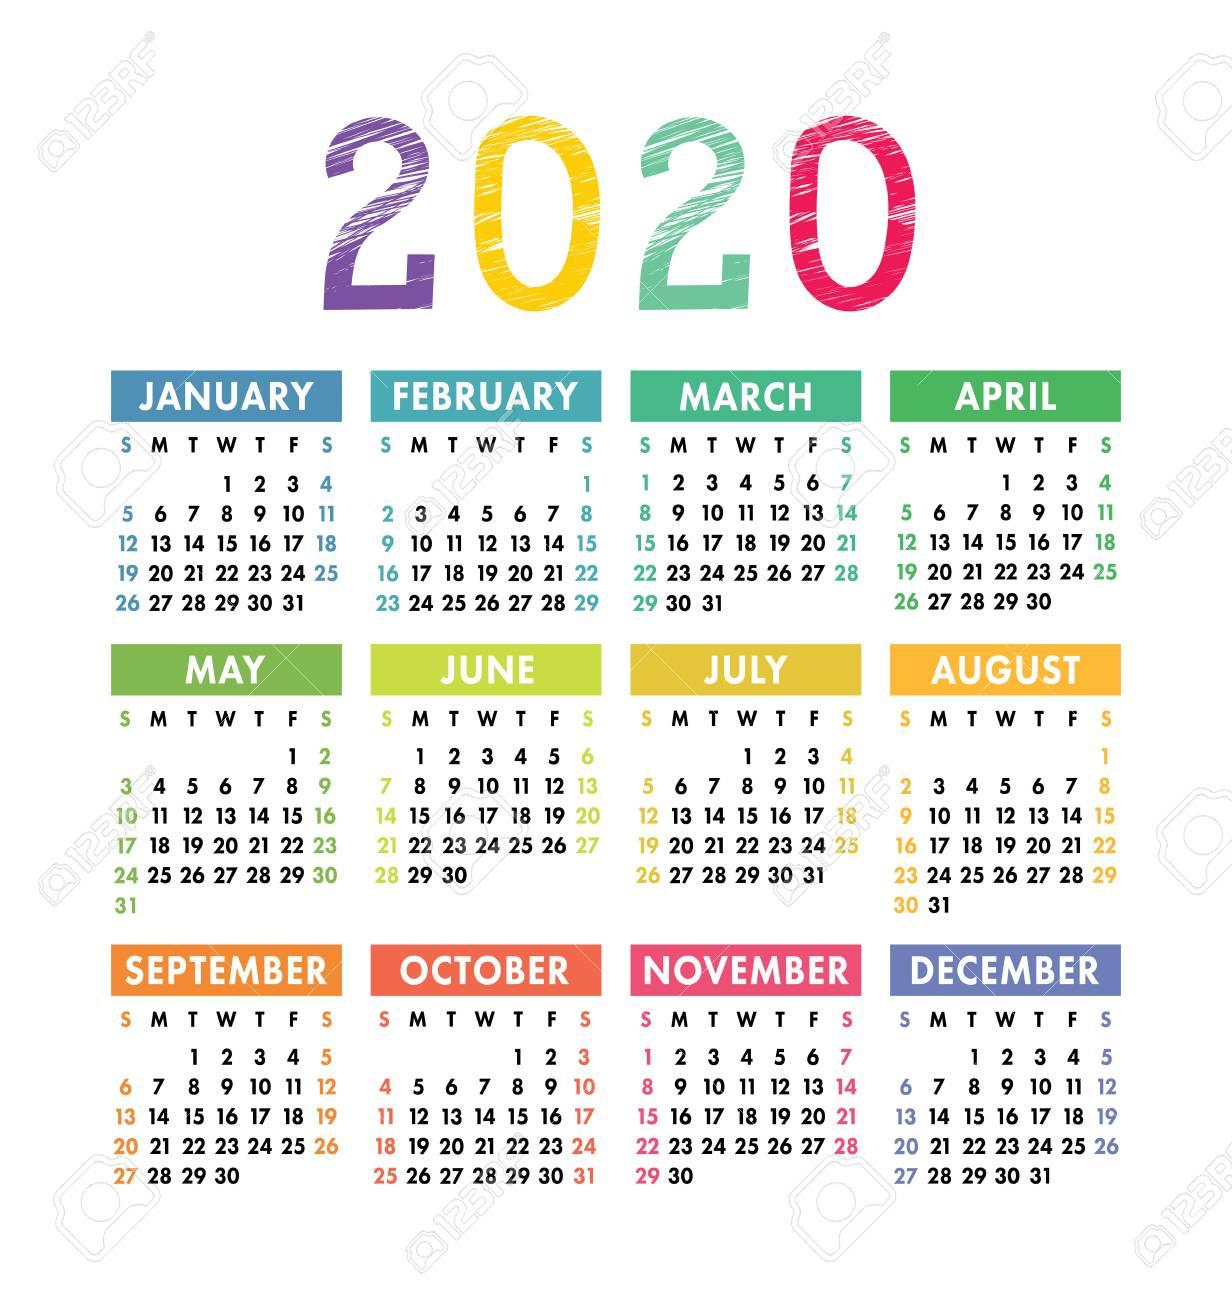 2 Year Pocket Calendar 2020 2021 | Calendar Template